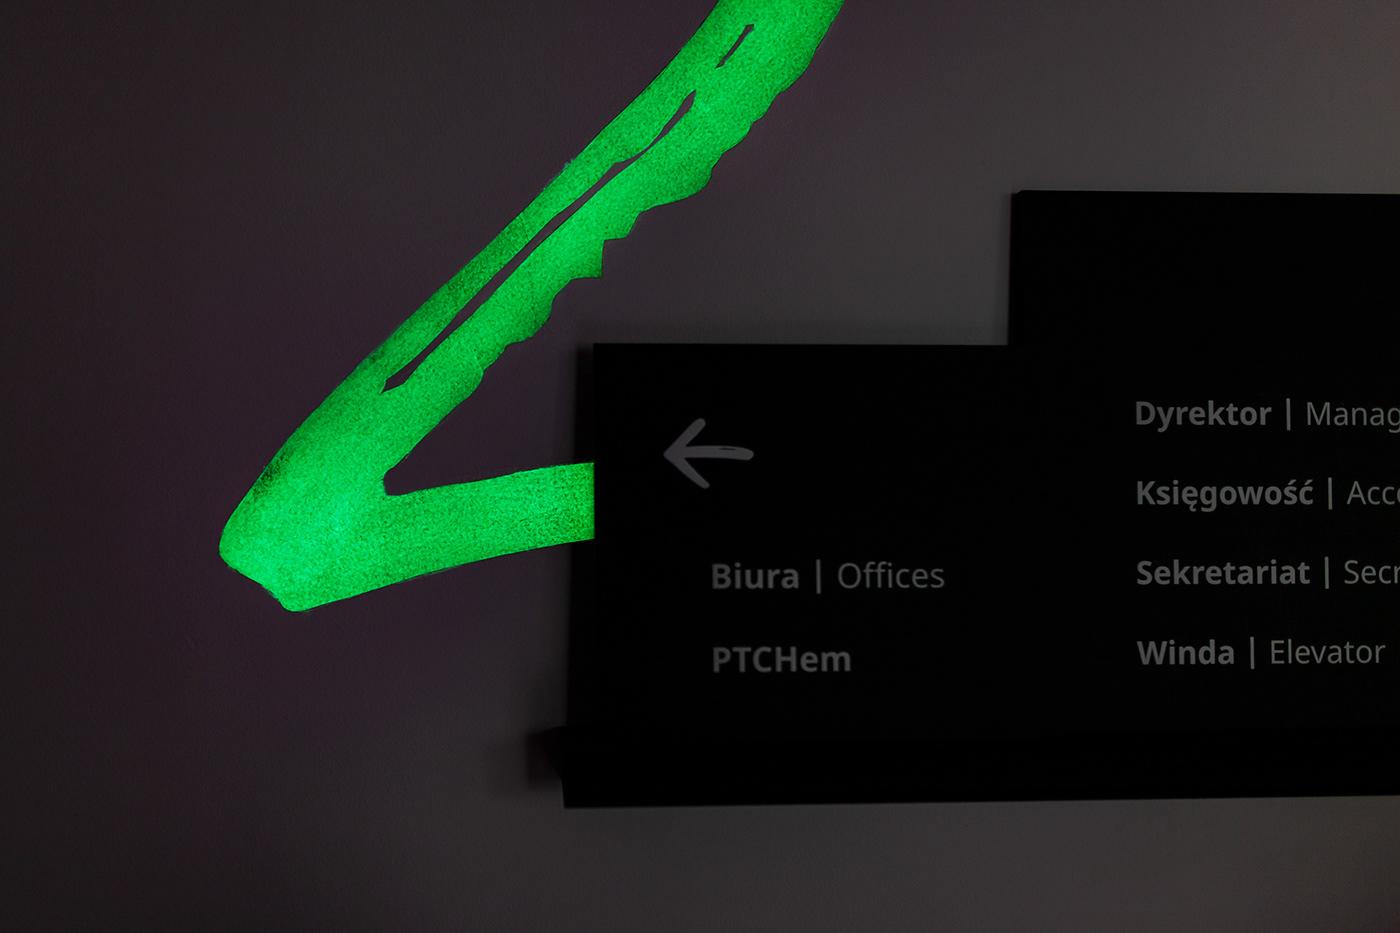 environmetal design icons pictograms Sign design Signage signs wayfinding wayfinding system wayshowing